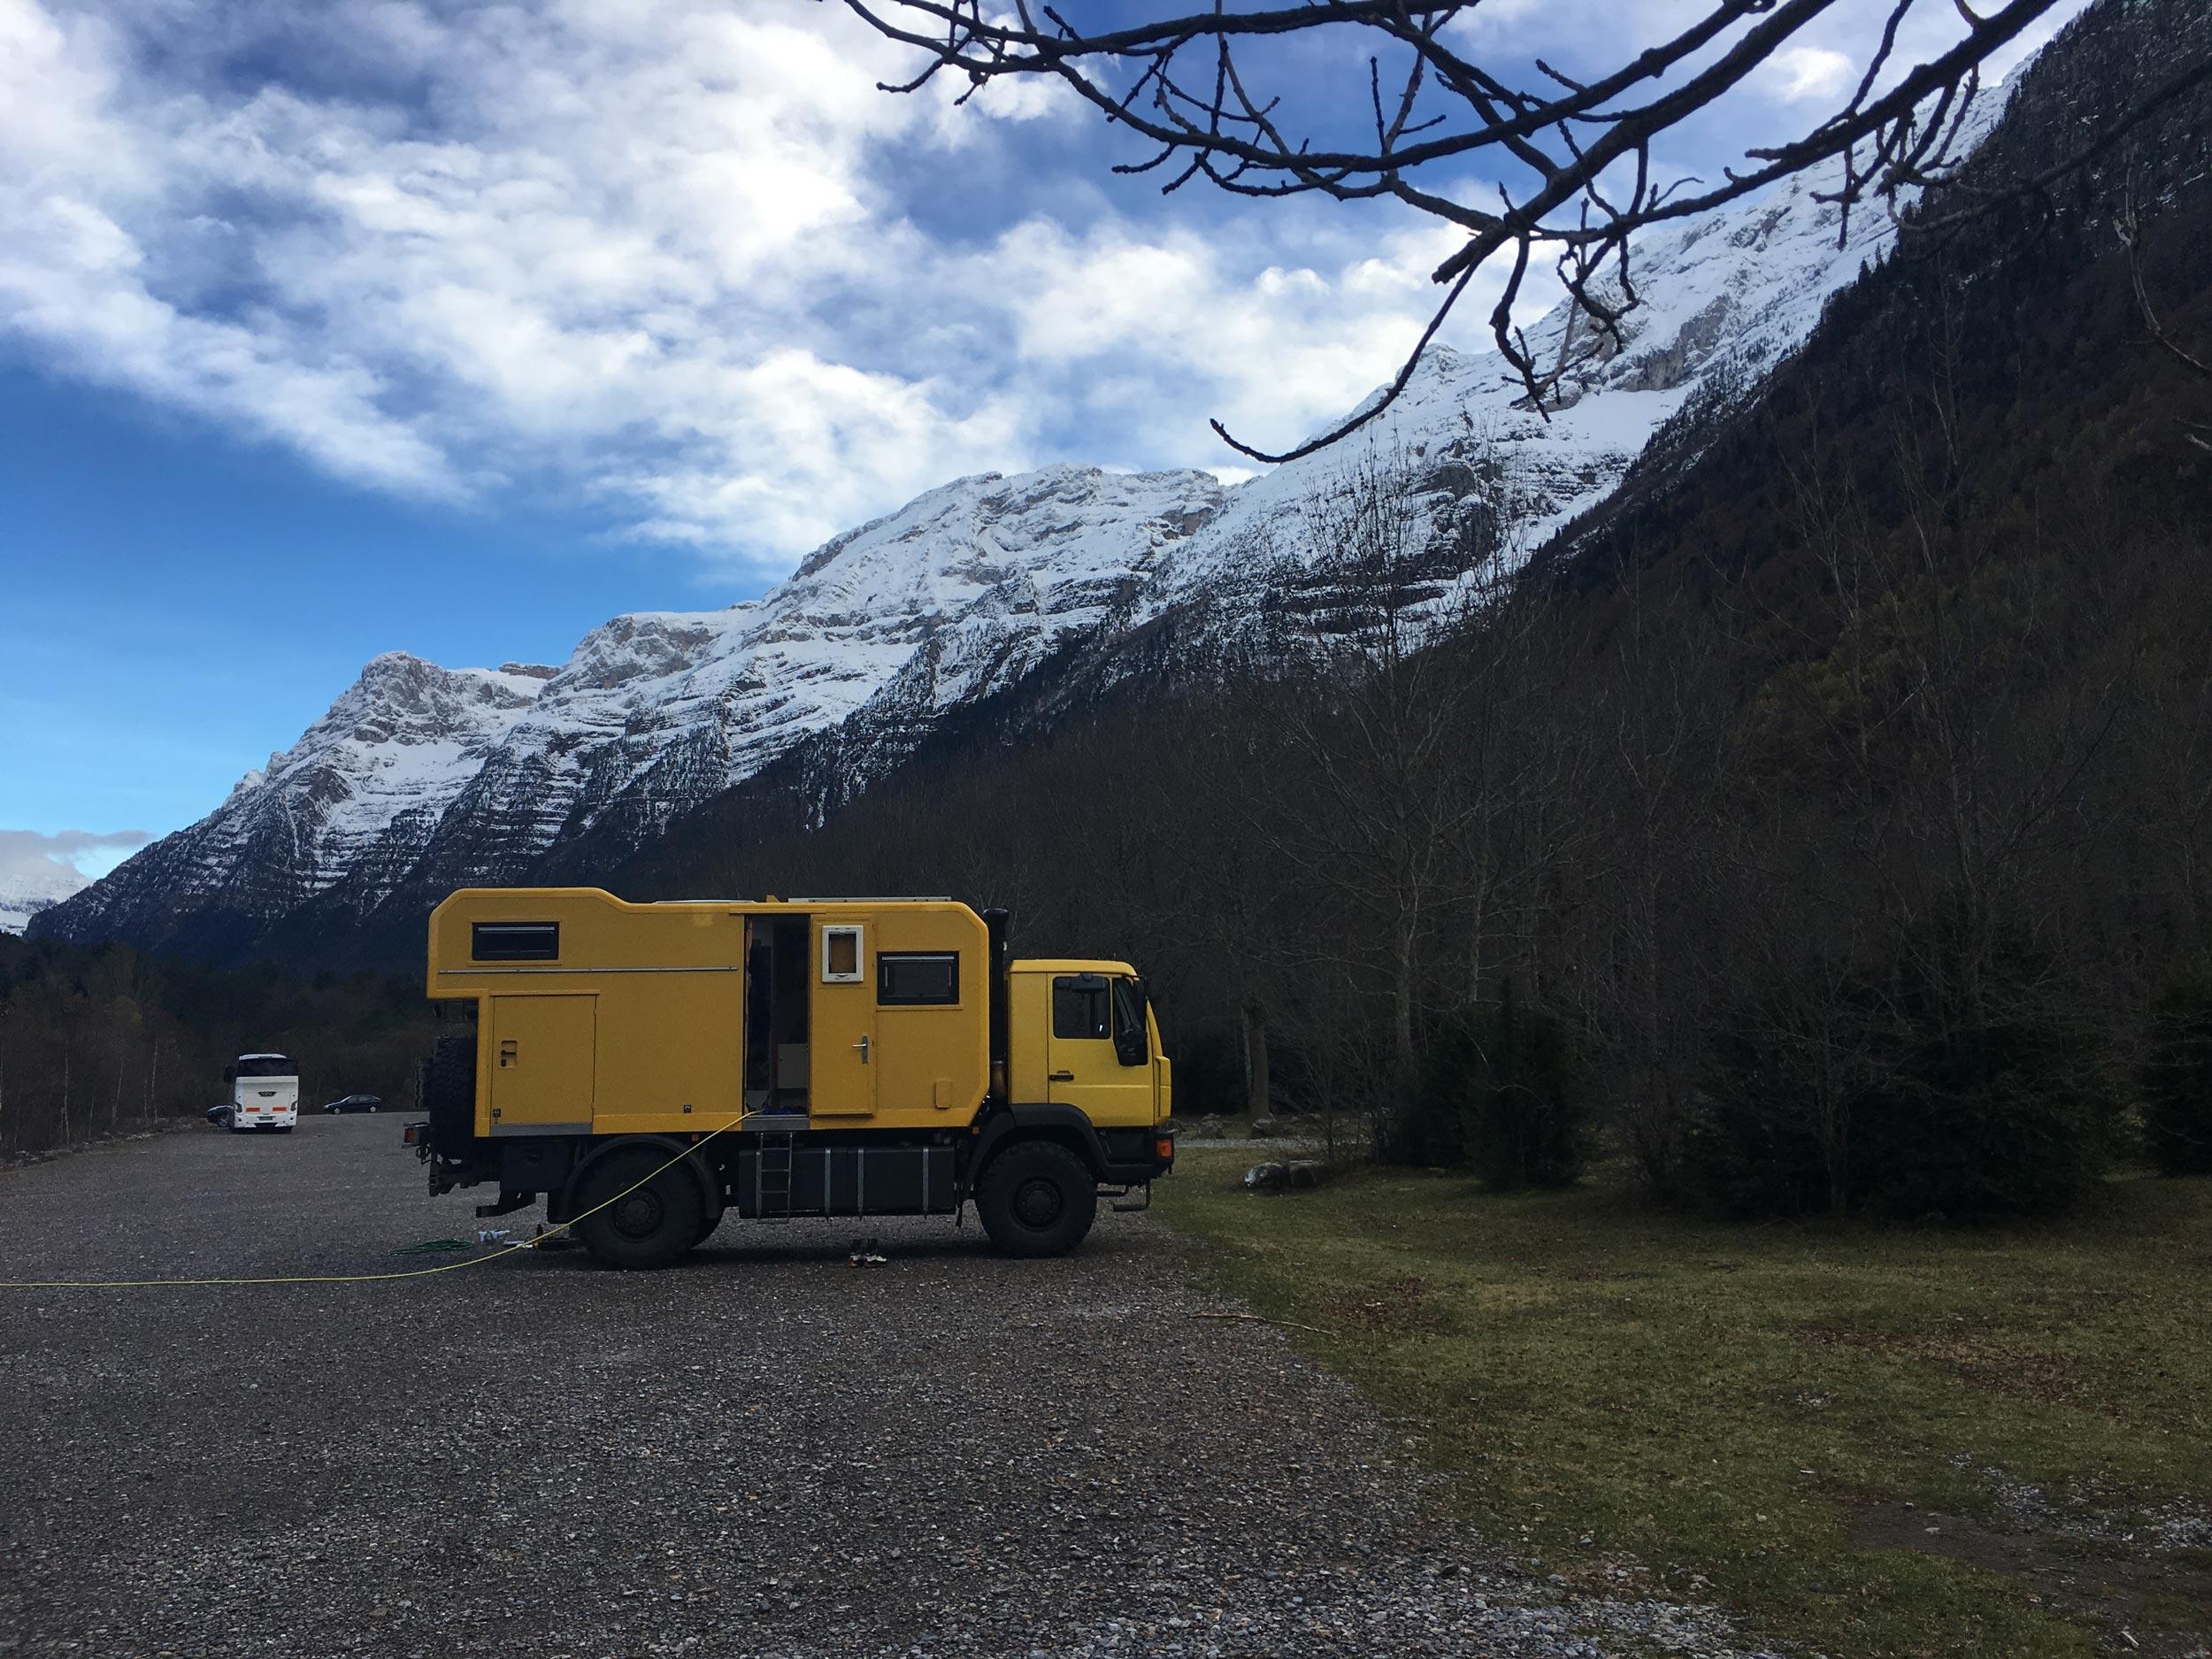 unbeaten-adventures-mountain-biking-pyrenees-zona-zero-ainsa-vanlife-overlander-truck.jpg